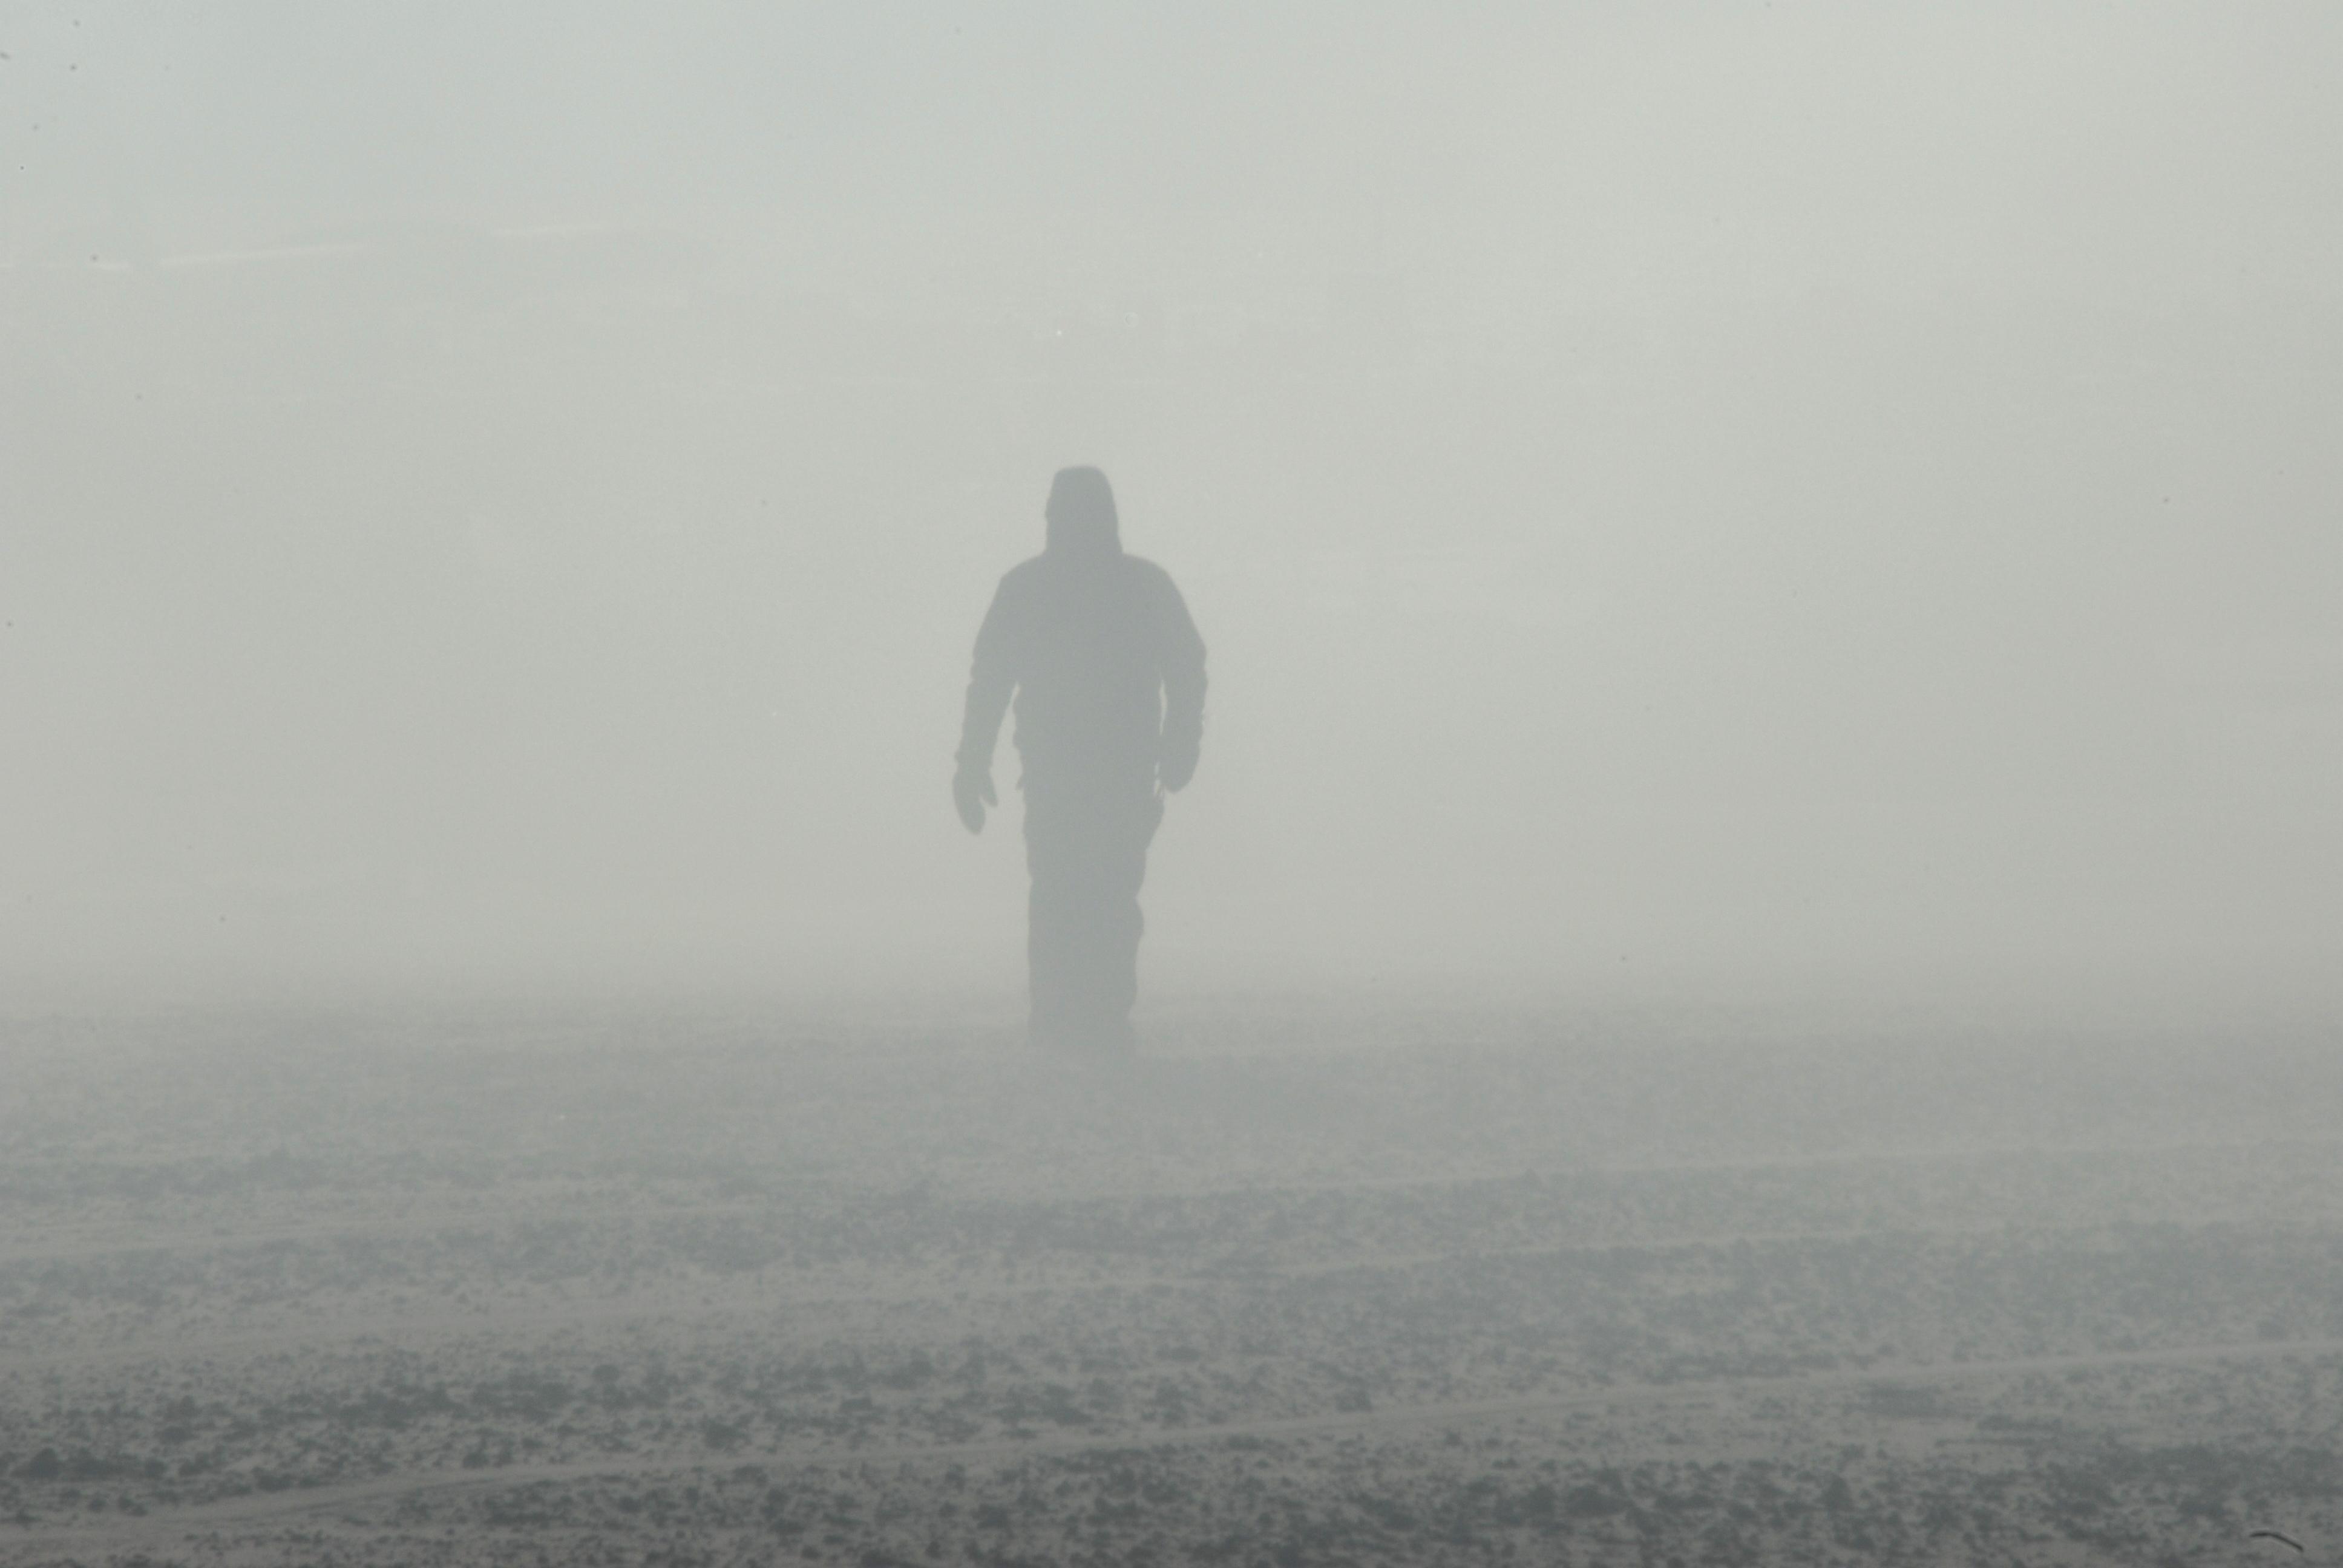 http://photolibrary.usap.gov/AntarcticaLibrary/POLIEWALK.JPG